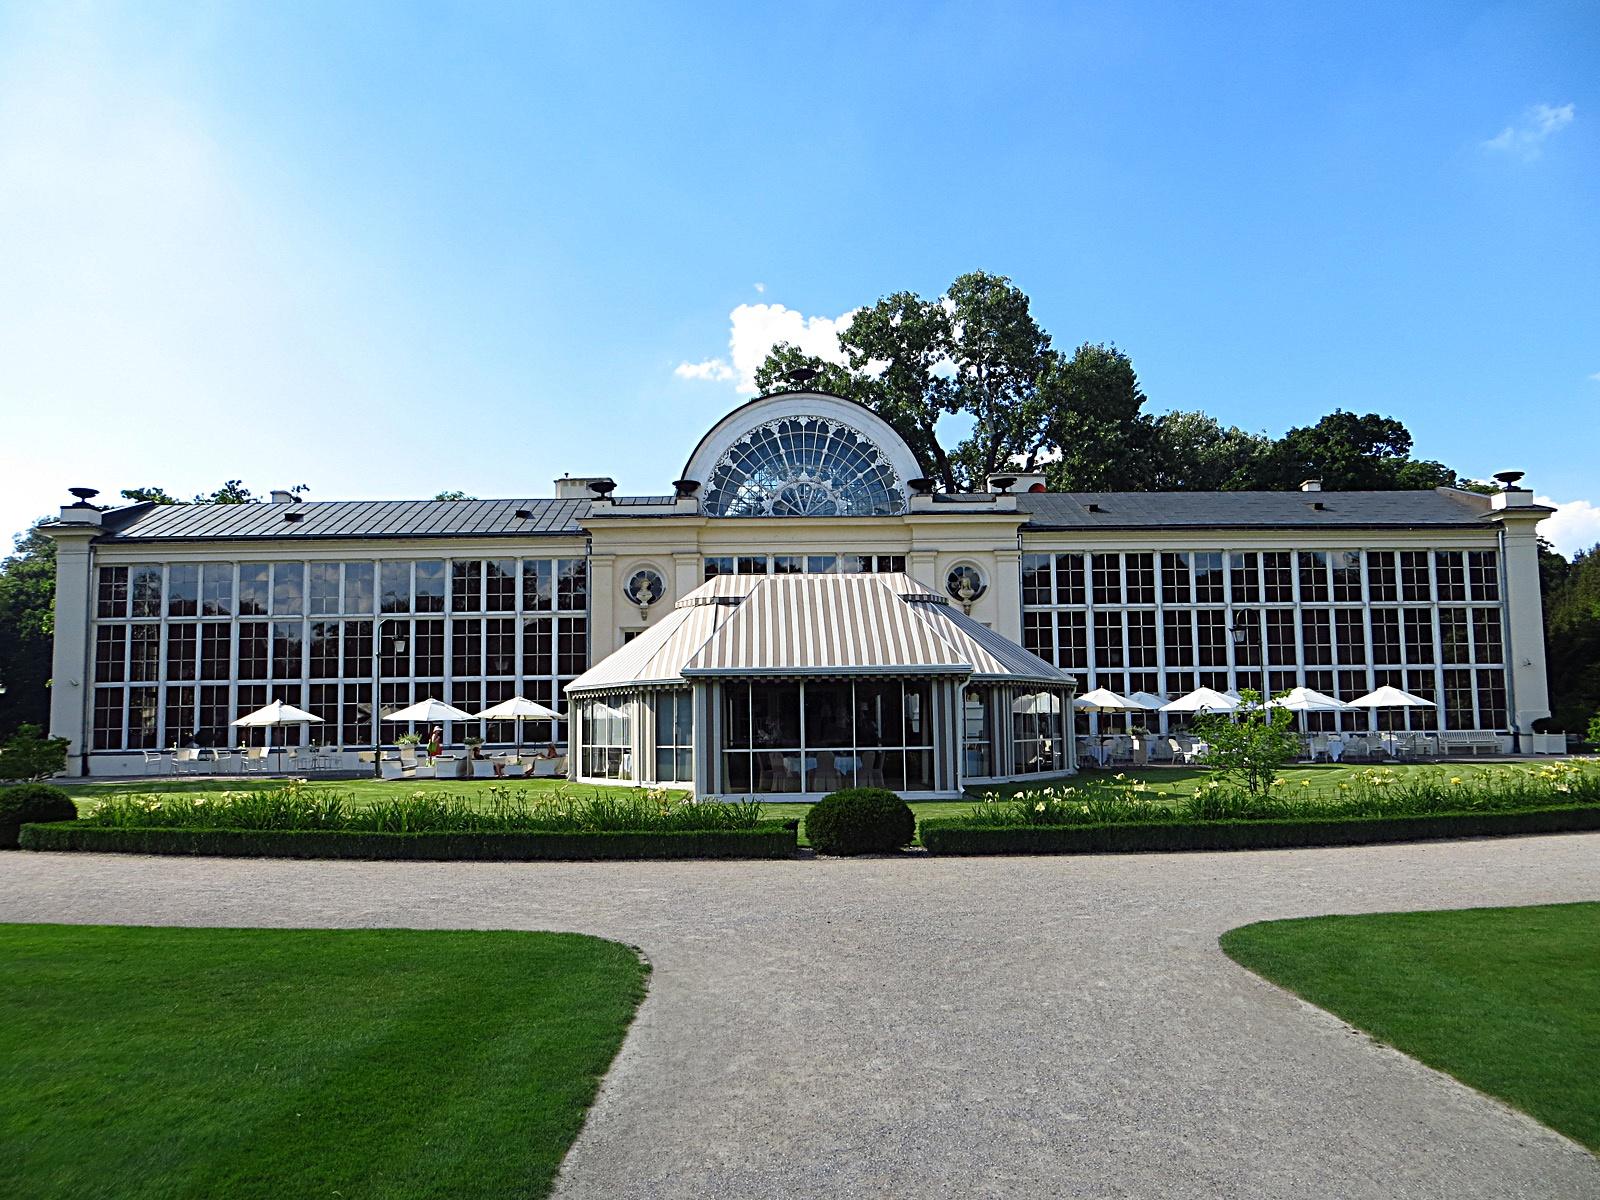 Filełazienki Królewskie Restauracja Belvedere Panoramio